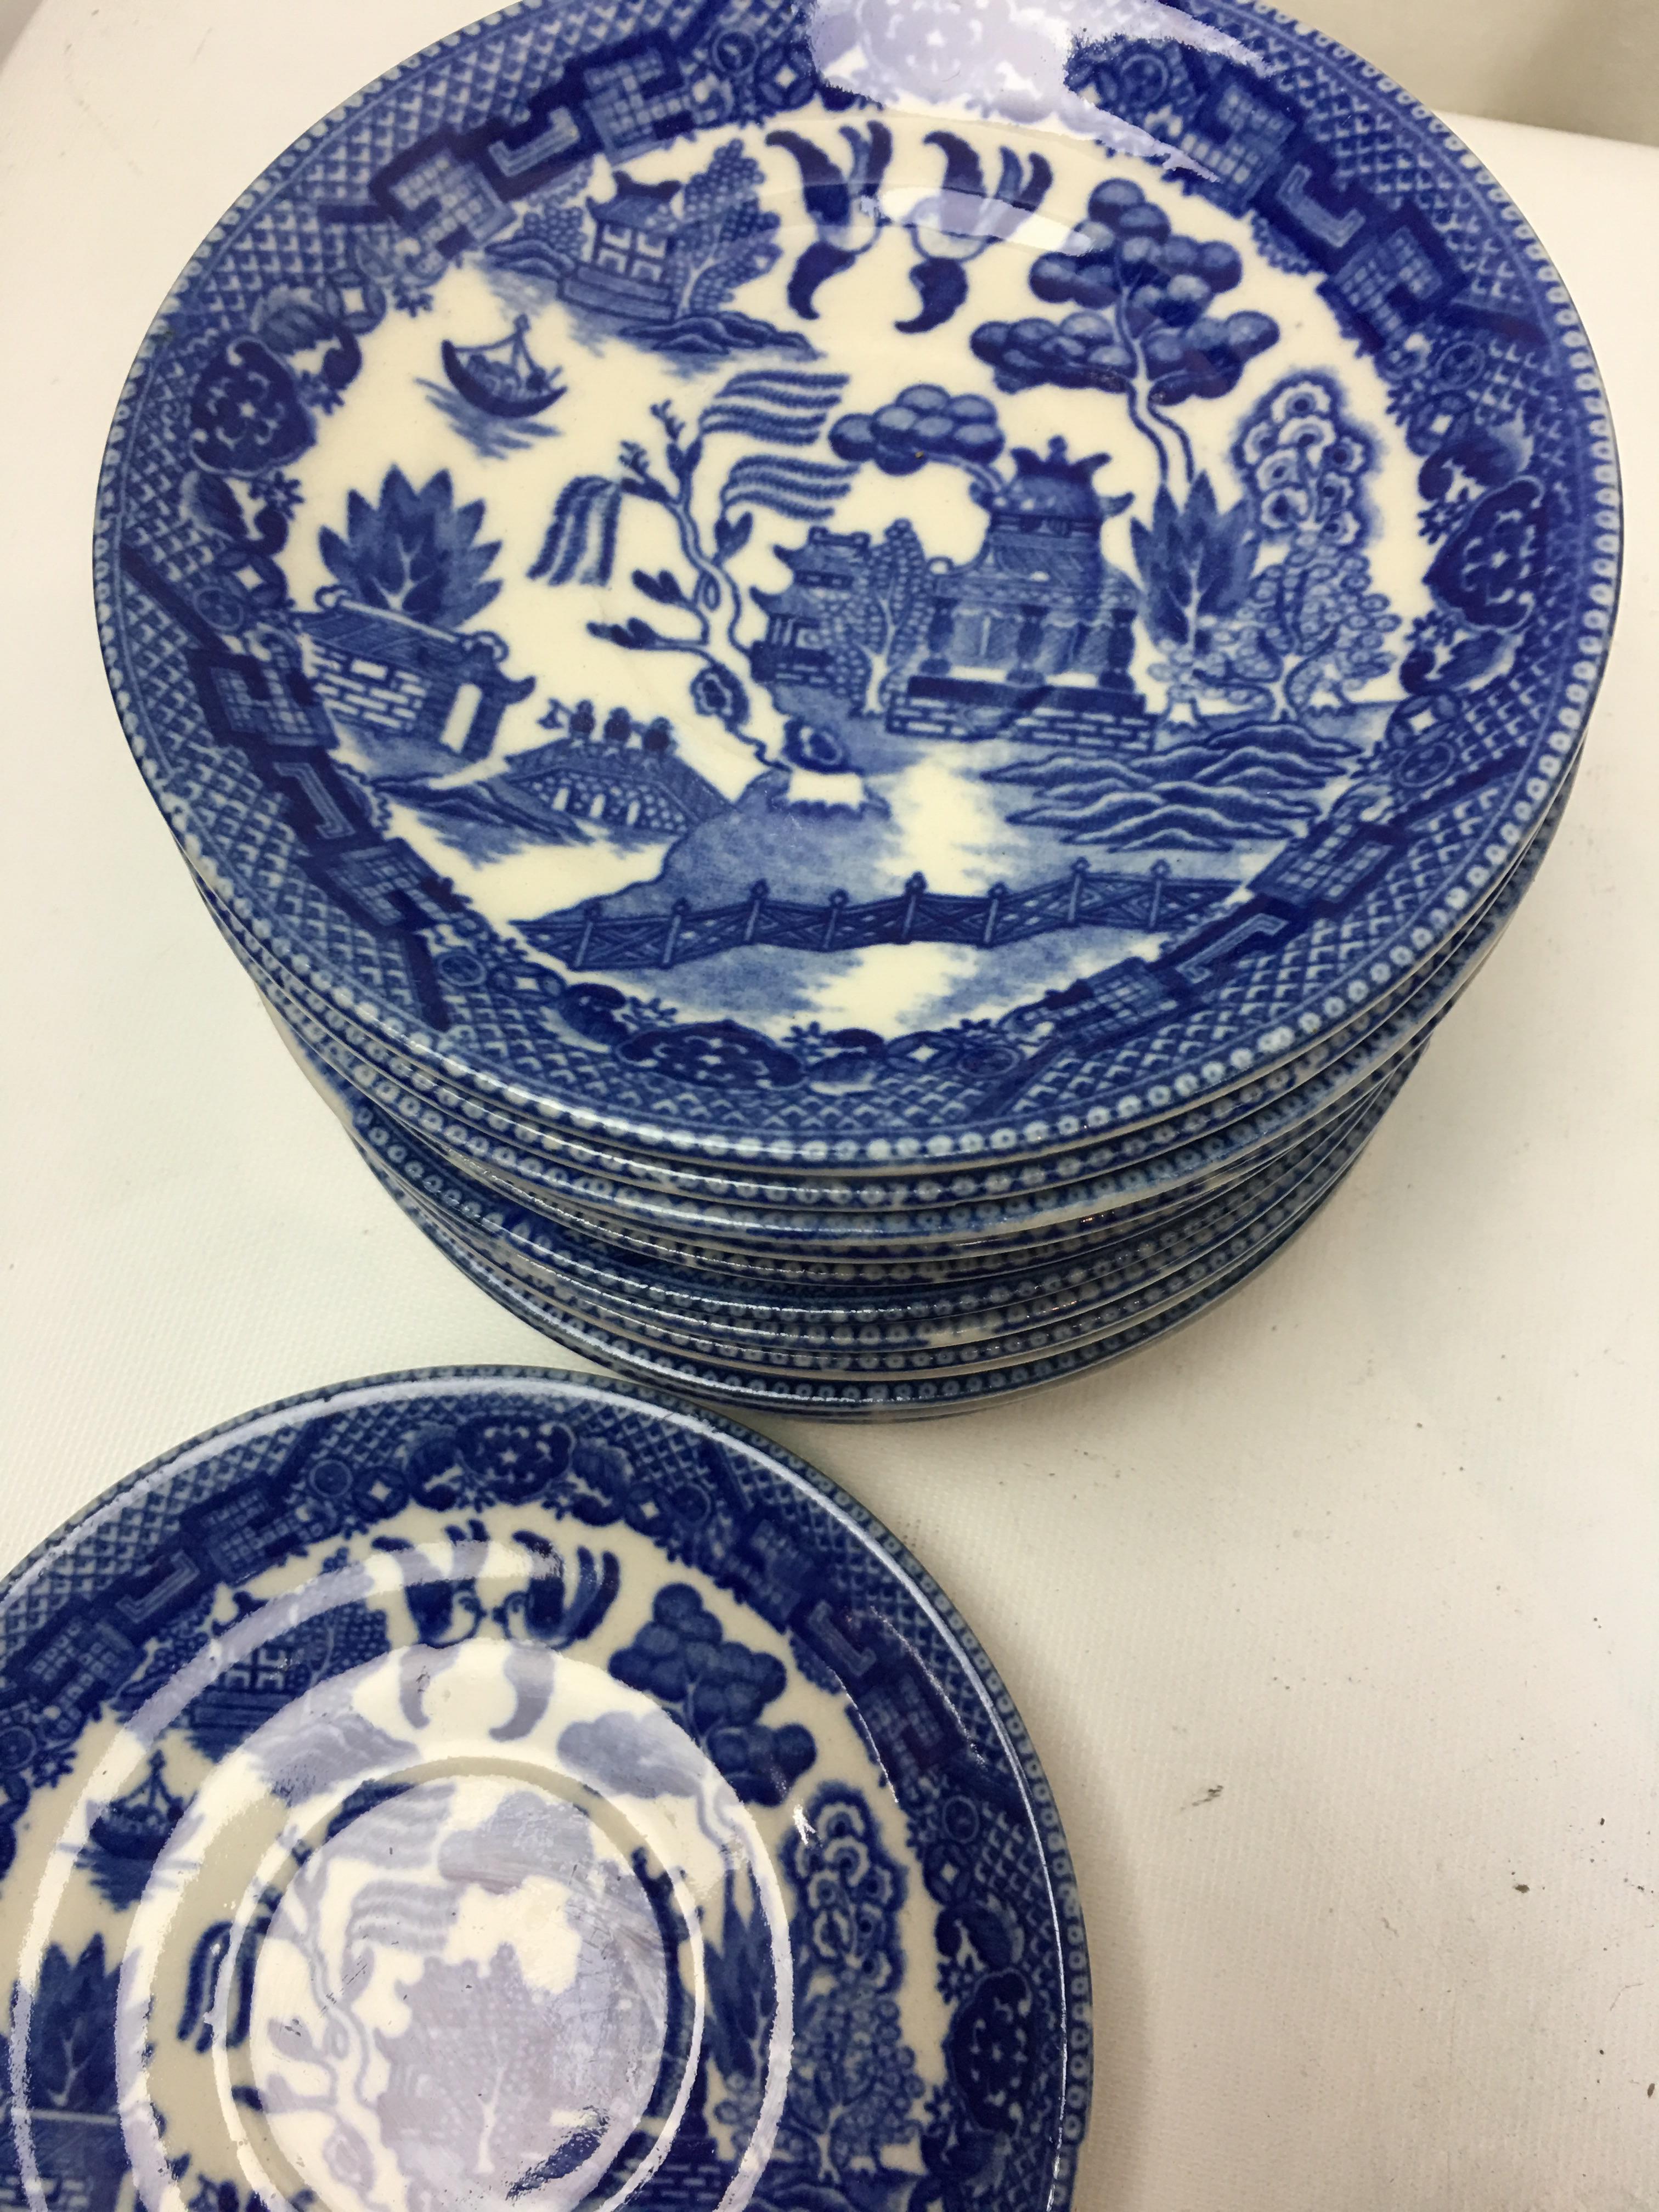 Blue \u0026 White Chinoiserie Plates - Set of 16 - Image 3 ...  sc 1 st  Chairish & Blue \u0026 White Chinoiserie Plates - Set of 16 | Chairish